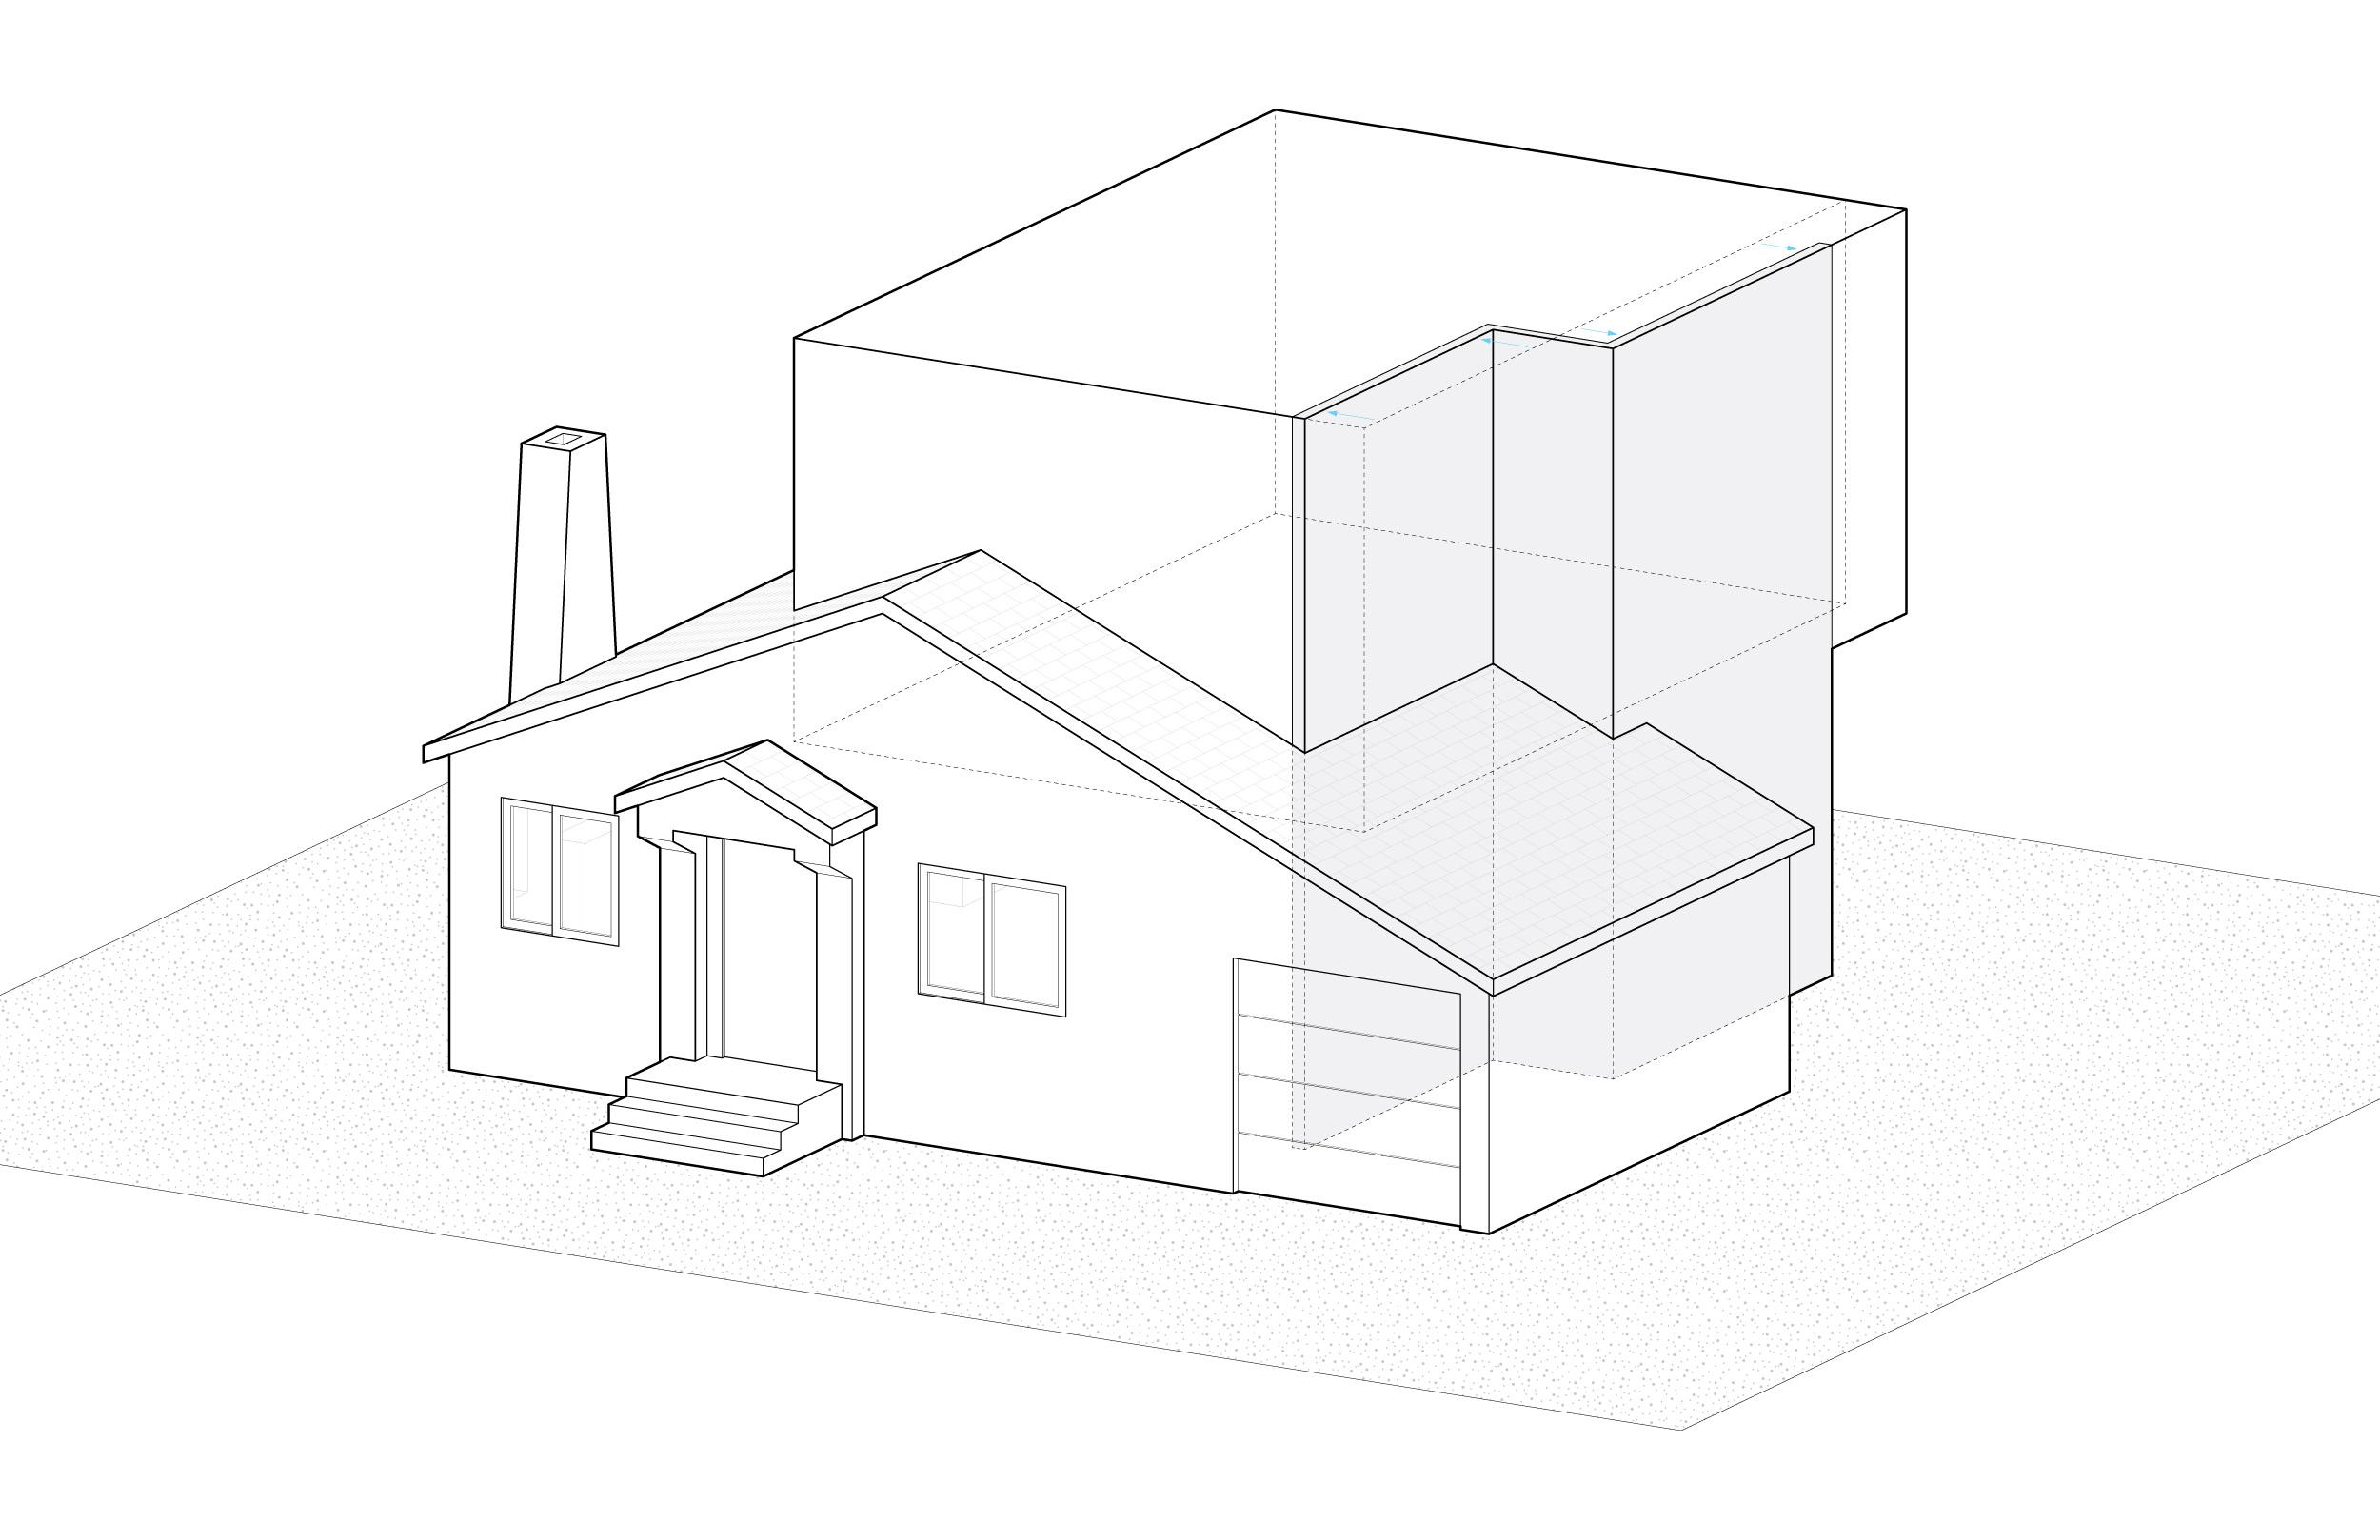 Rosewood-House_Diagram_04.jpg